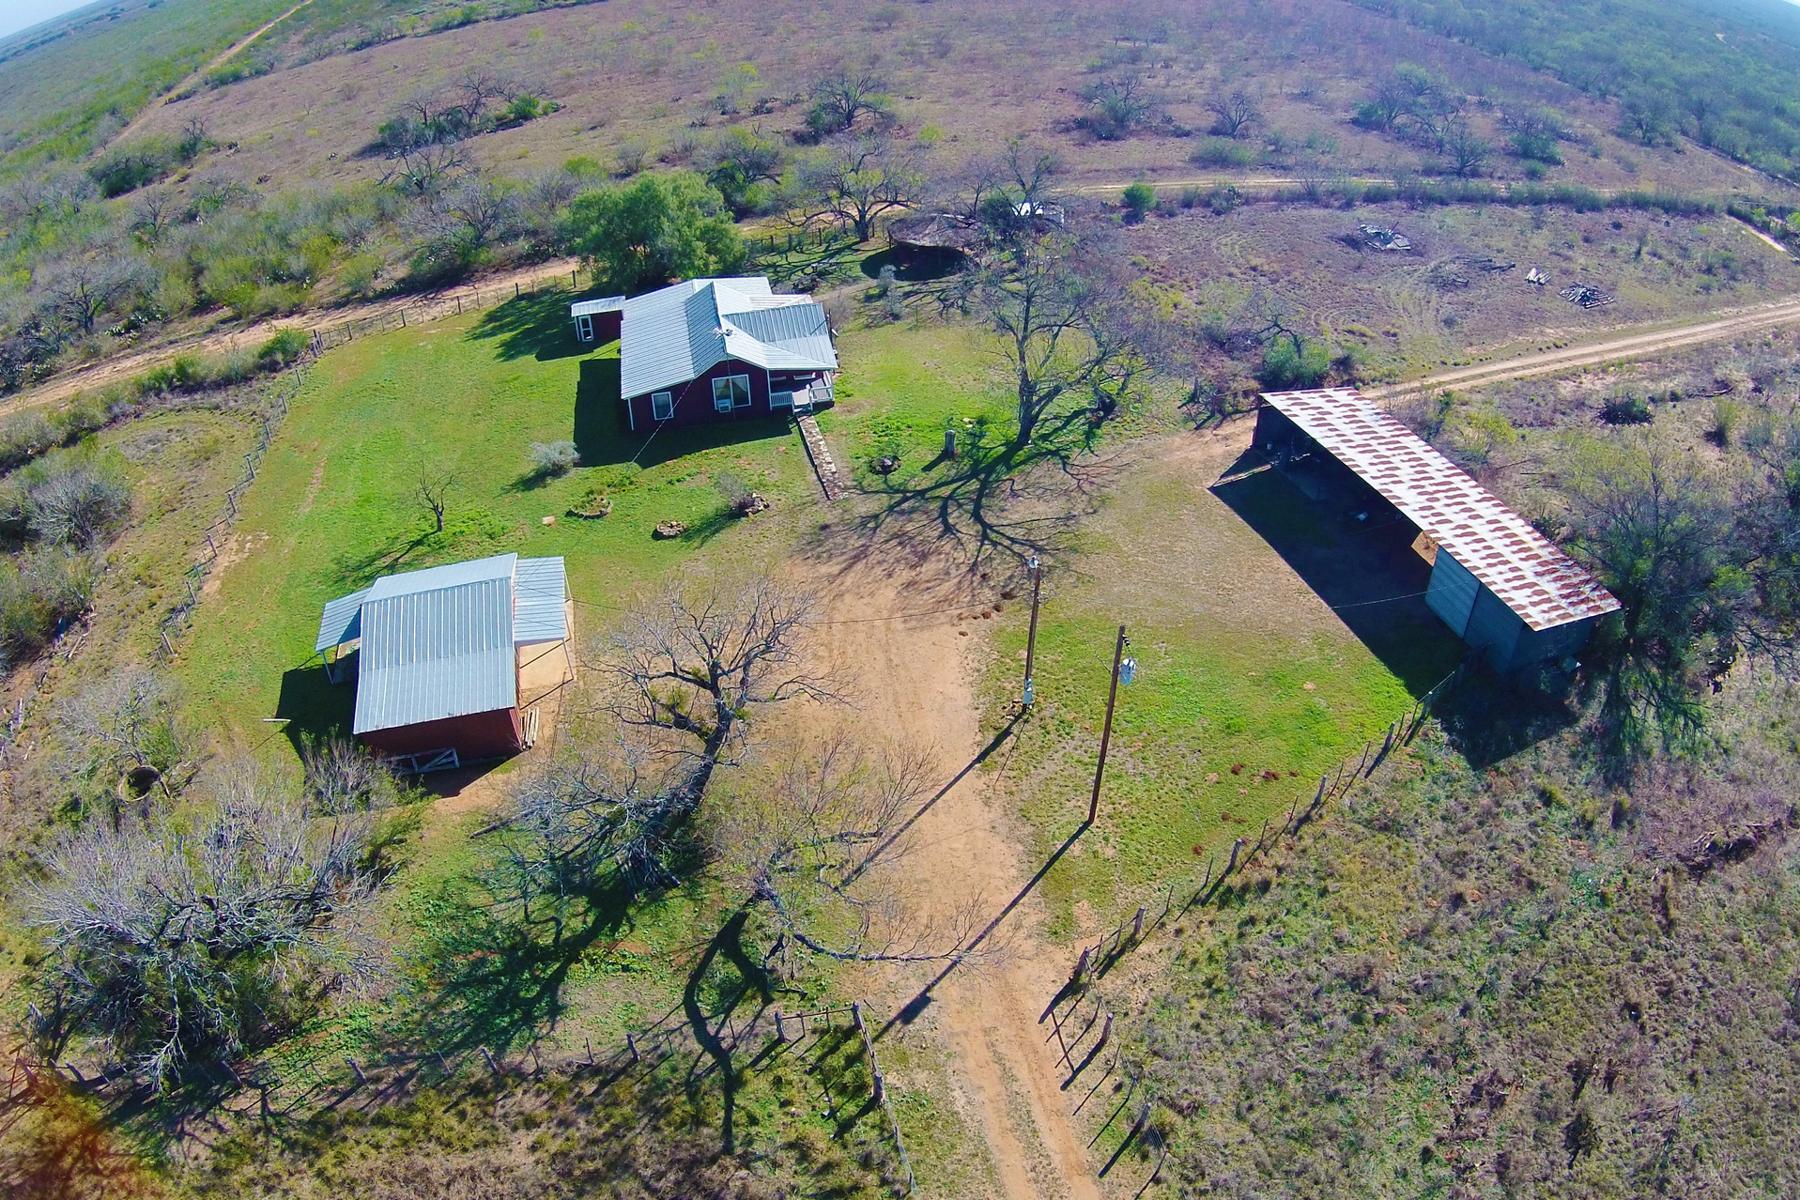 Additional photo for property listing at 702± Ac. Buckhorn Creek Ranch CR 3315  702 +- Acres Pearsall, Texas 78061 Estados Unidos